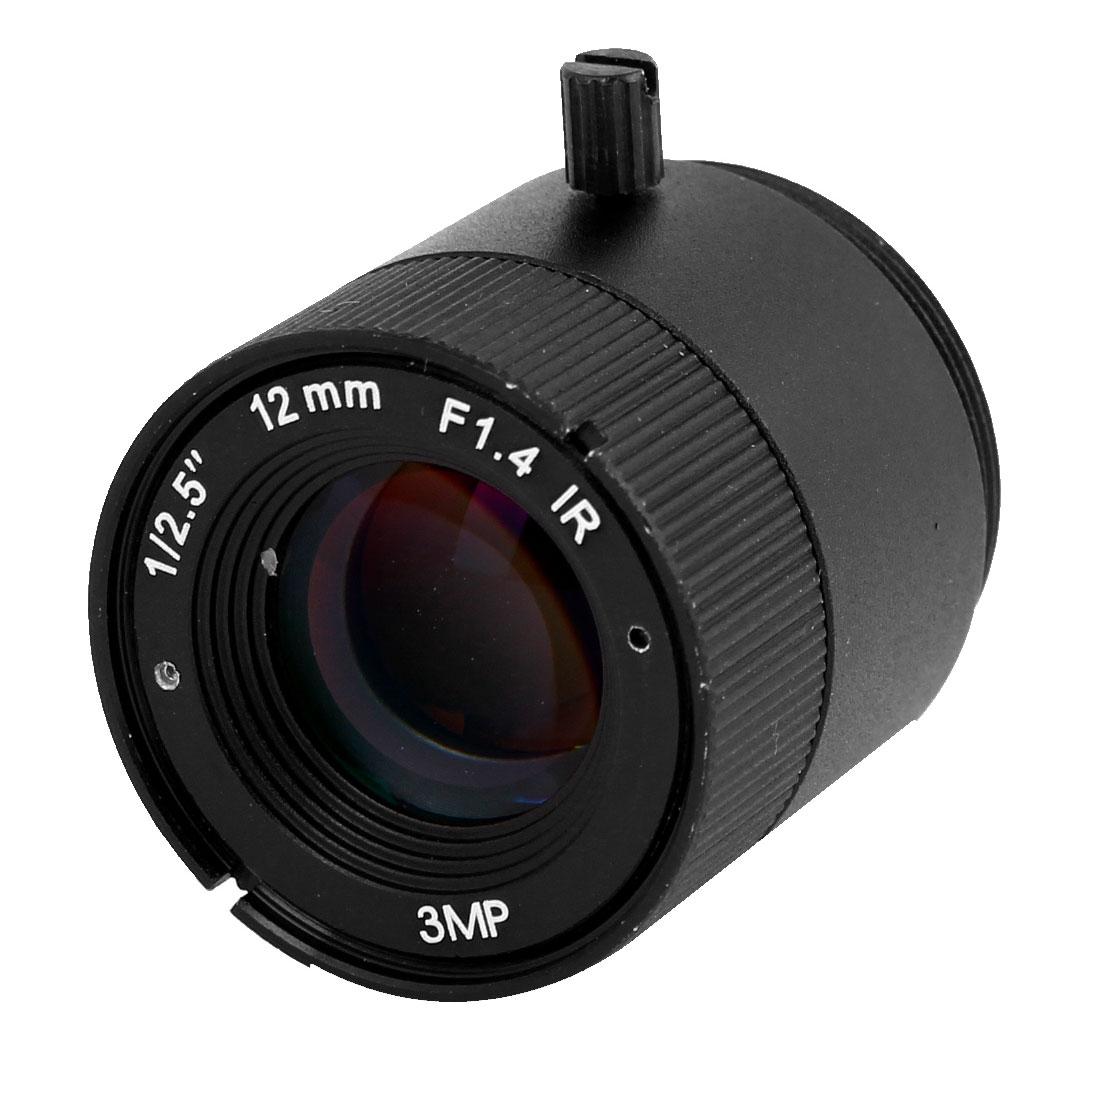 "CCTV Box Camera Fixed 12mm Focus Length 1/2.5"" 3MP IR Board Lens F1.4"